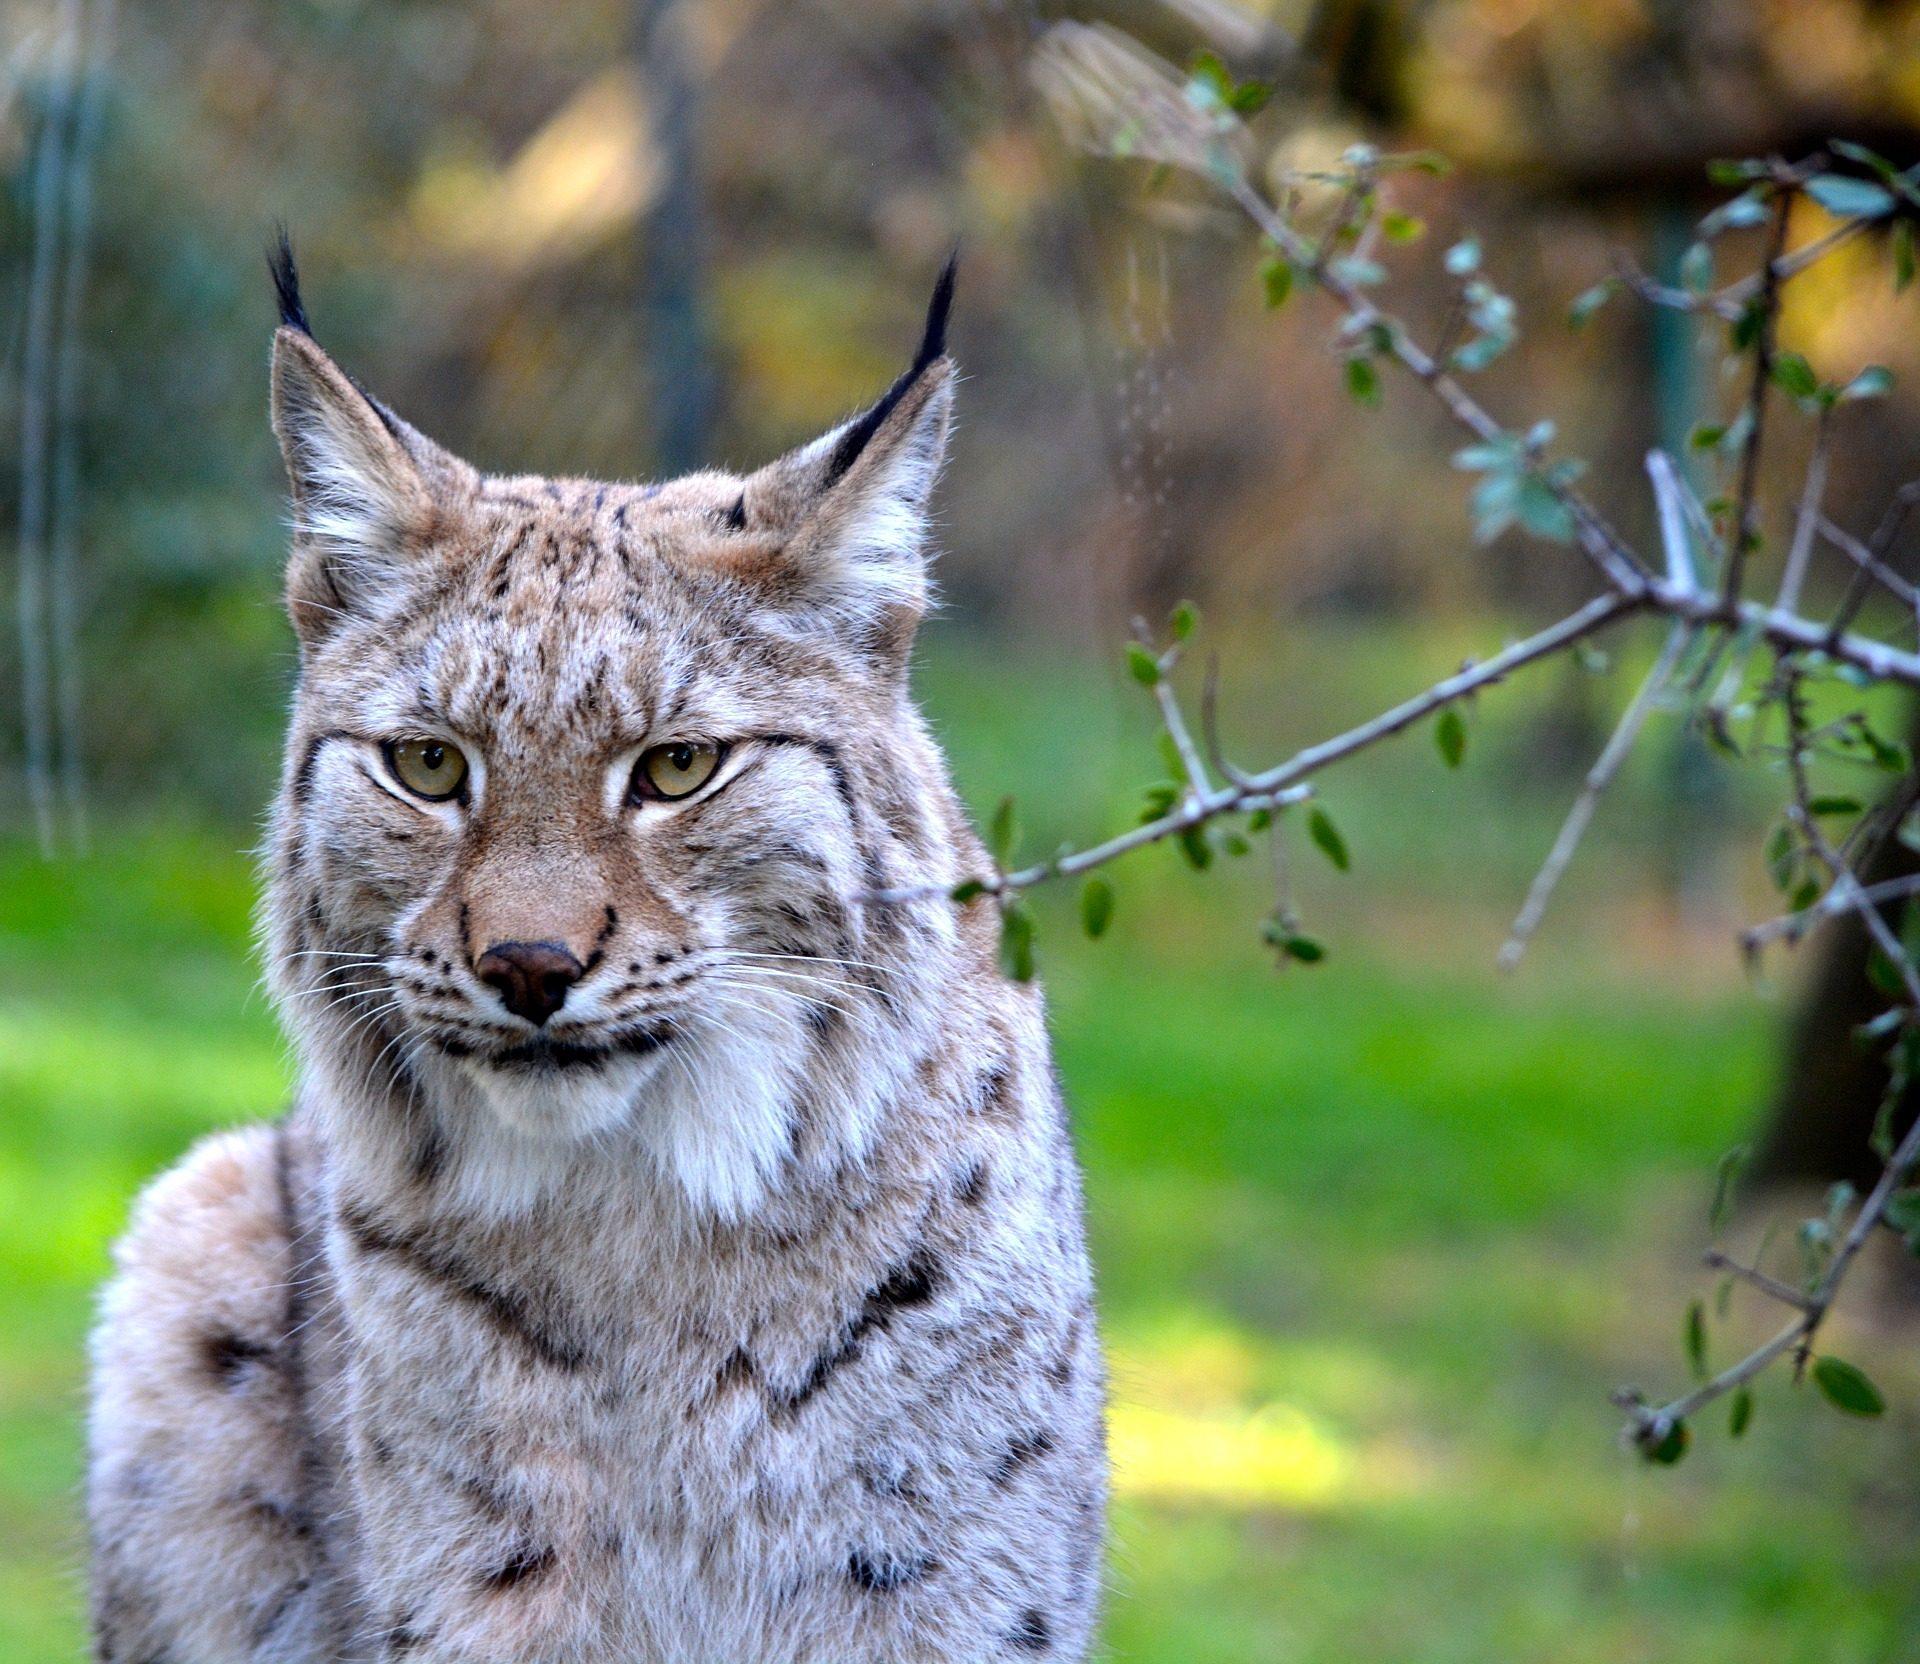 Lynx, ネコ科の動物, フィールド, フォレスト, 野生 - HD の壁紙 - 教授-falken.com